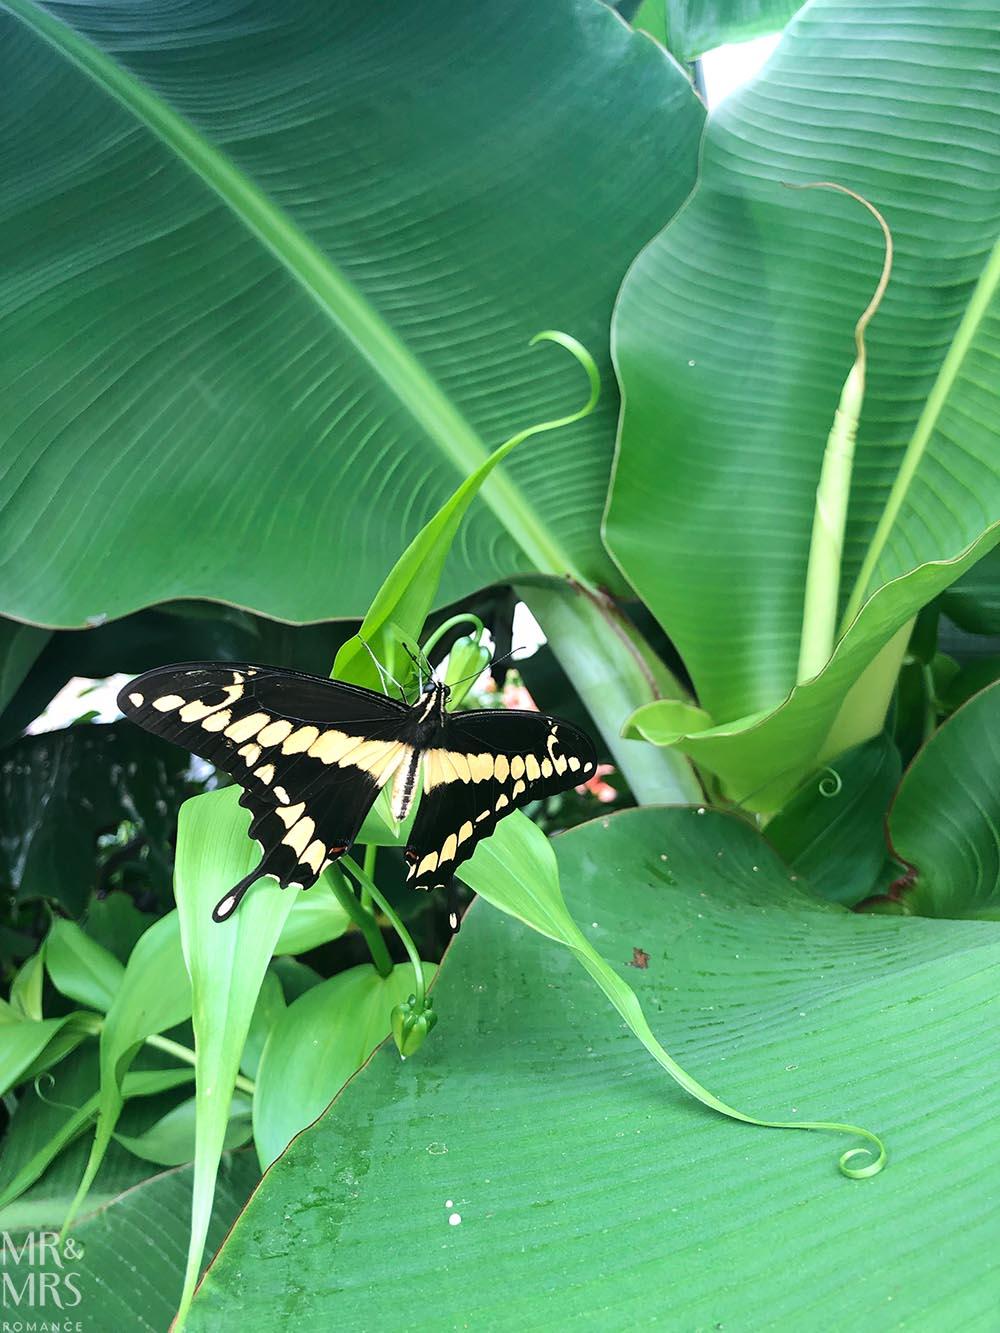 Blenheim Palace Pleasure Gardens butterfly house